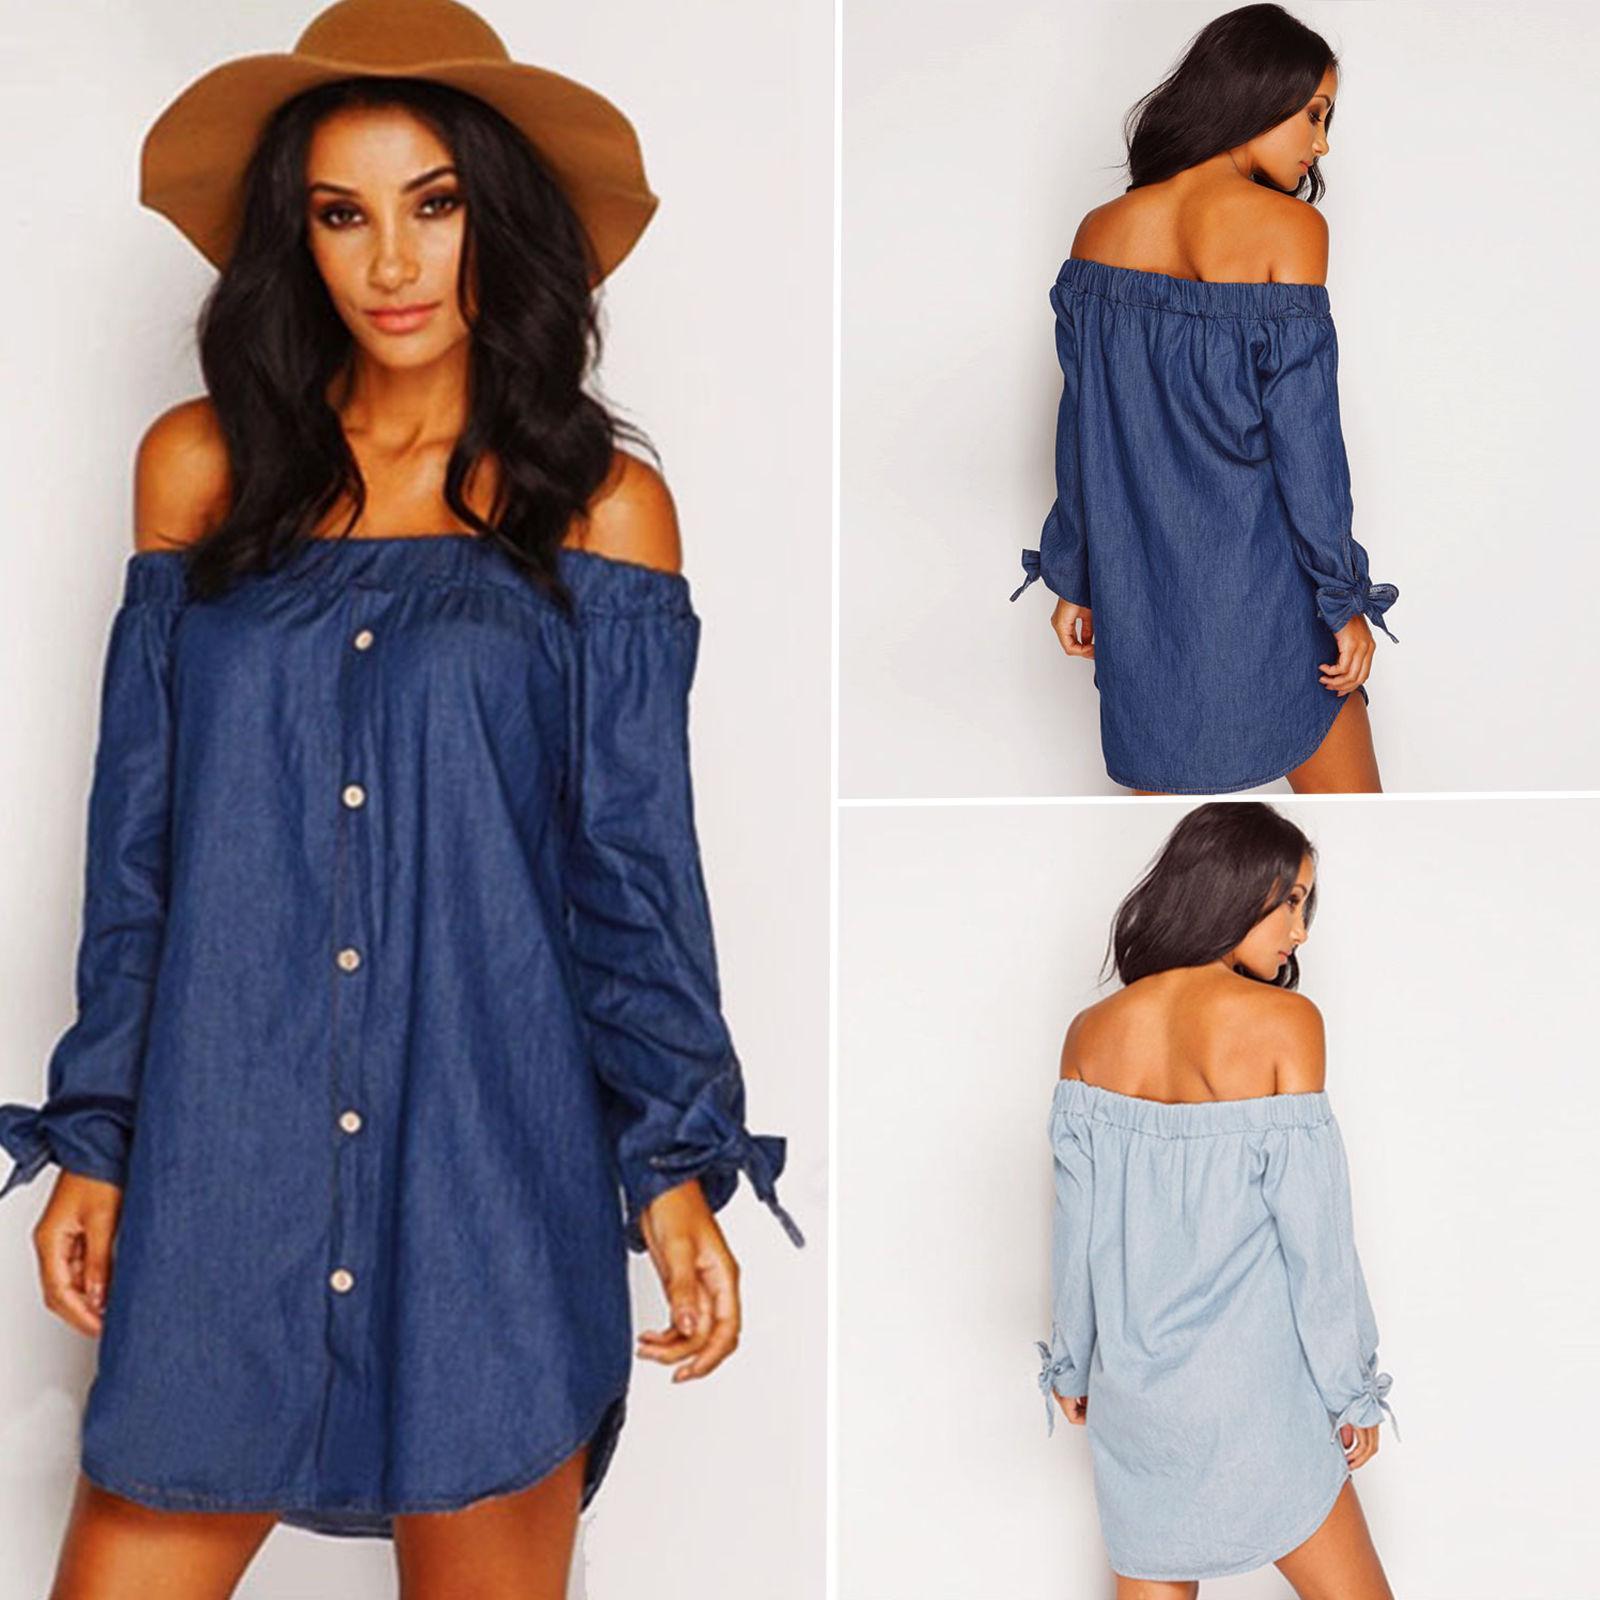 ee19e9b9b541b Dresses Women Denim Off Shoulder Dress Long Sleeve Denim Shirt Summer Sexy  Dress Tops Elegant Shirt Dresses Loose Slash Neck Blouse BBA154 Halter Dress  Blue ...